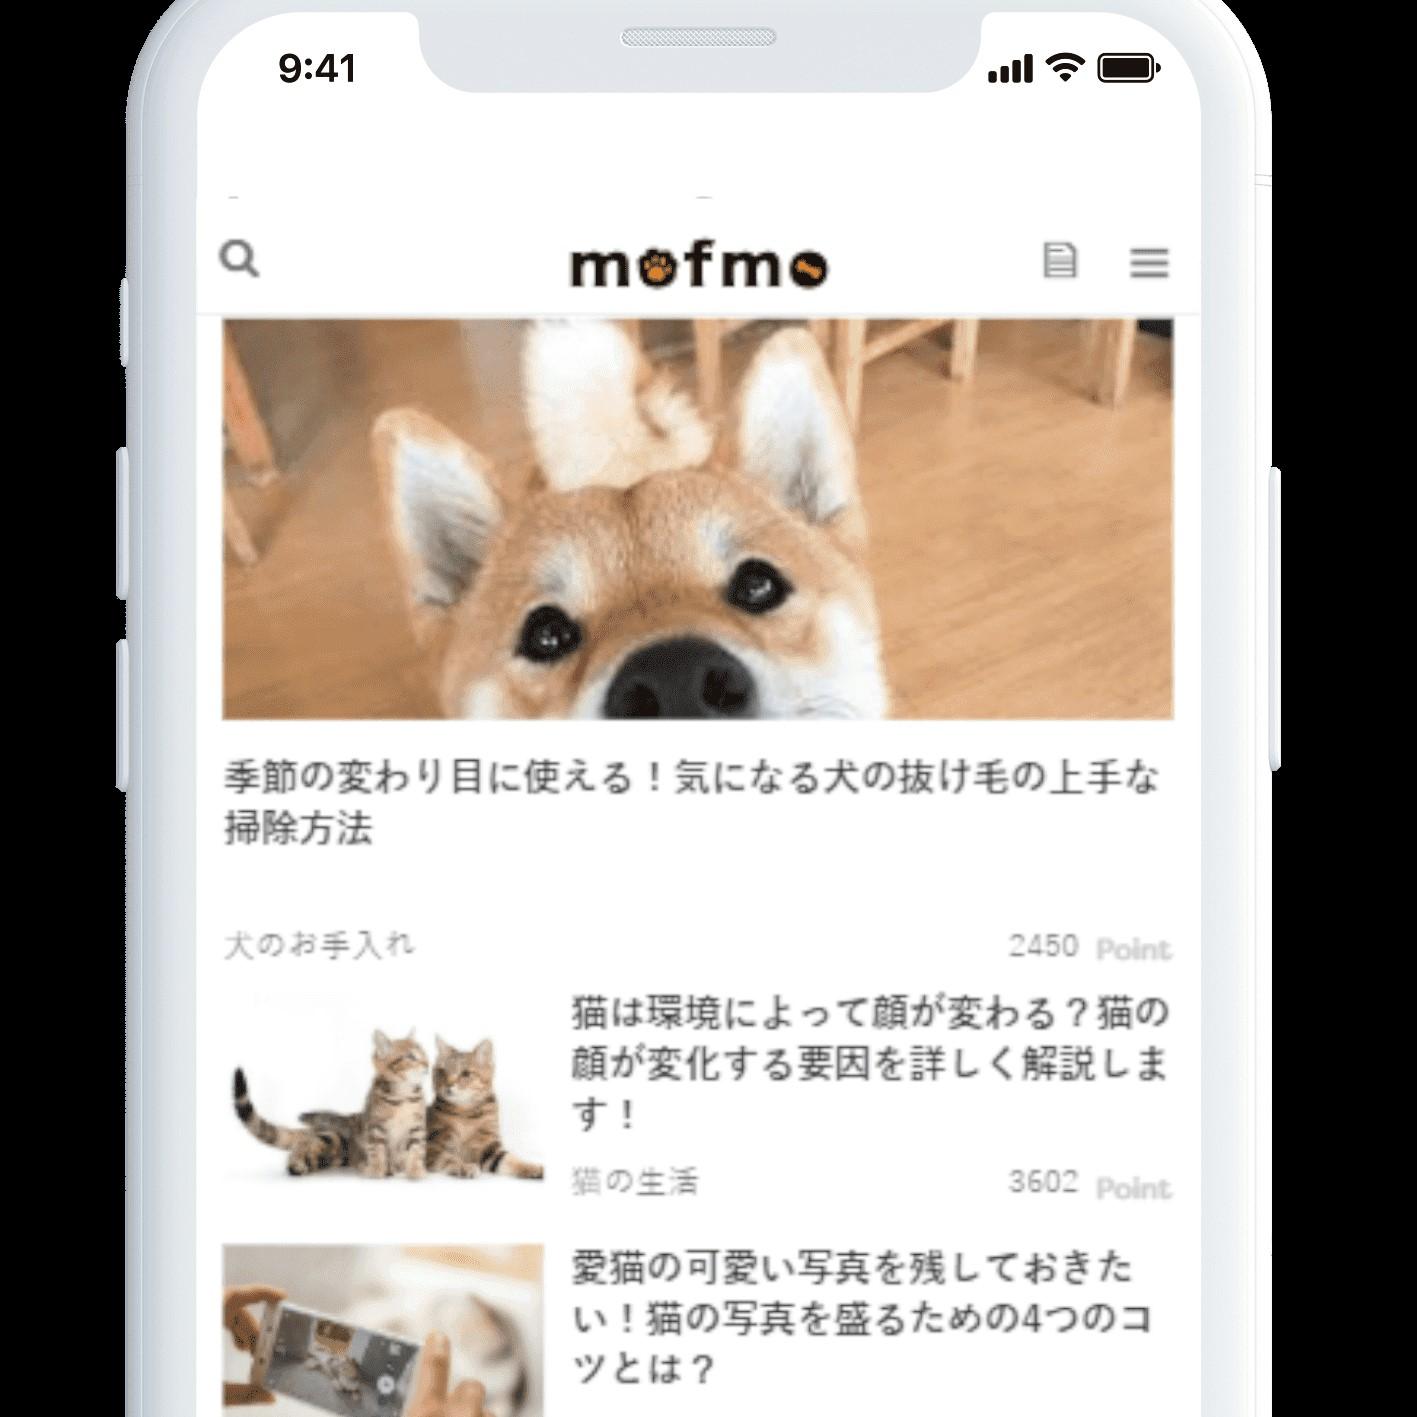 mofmo[モフモ]はどんなメディア?犬・猫飼い主必見の記事多数!